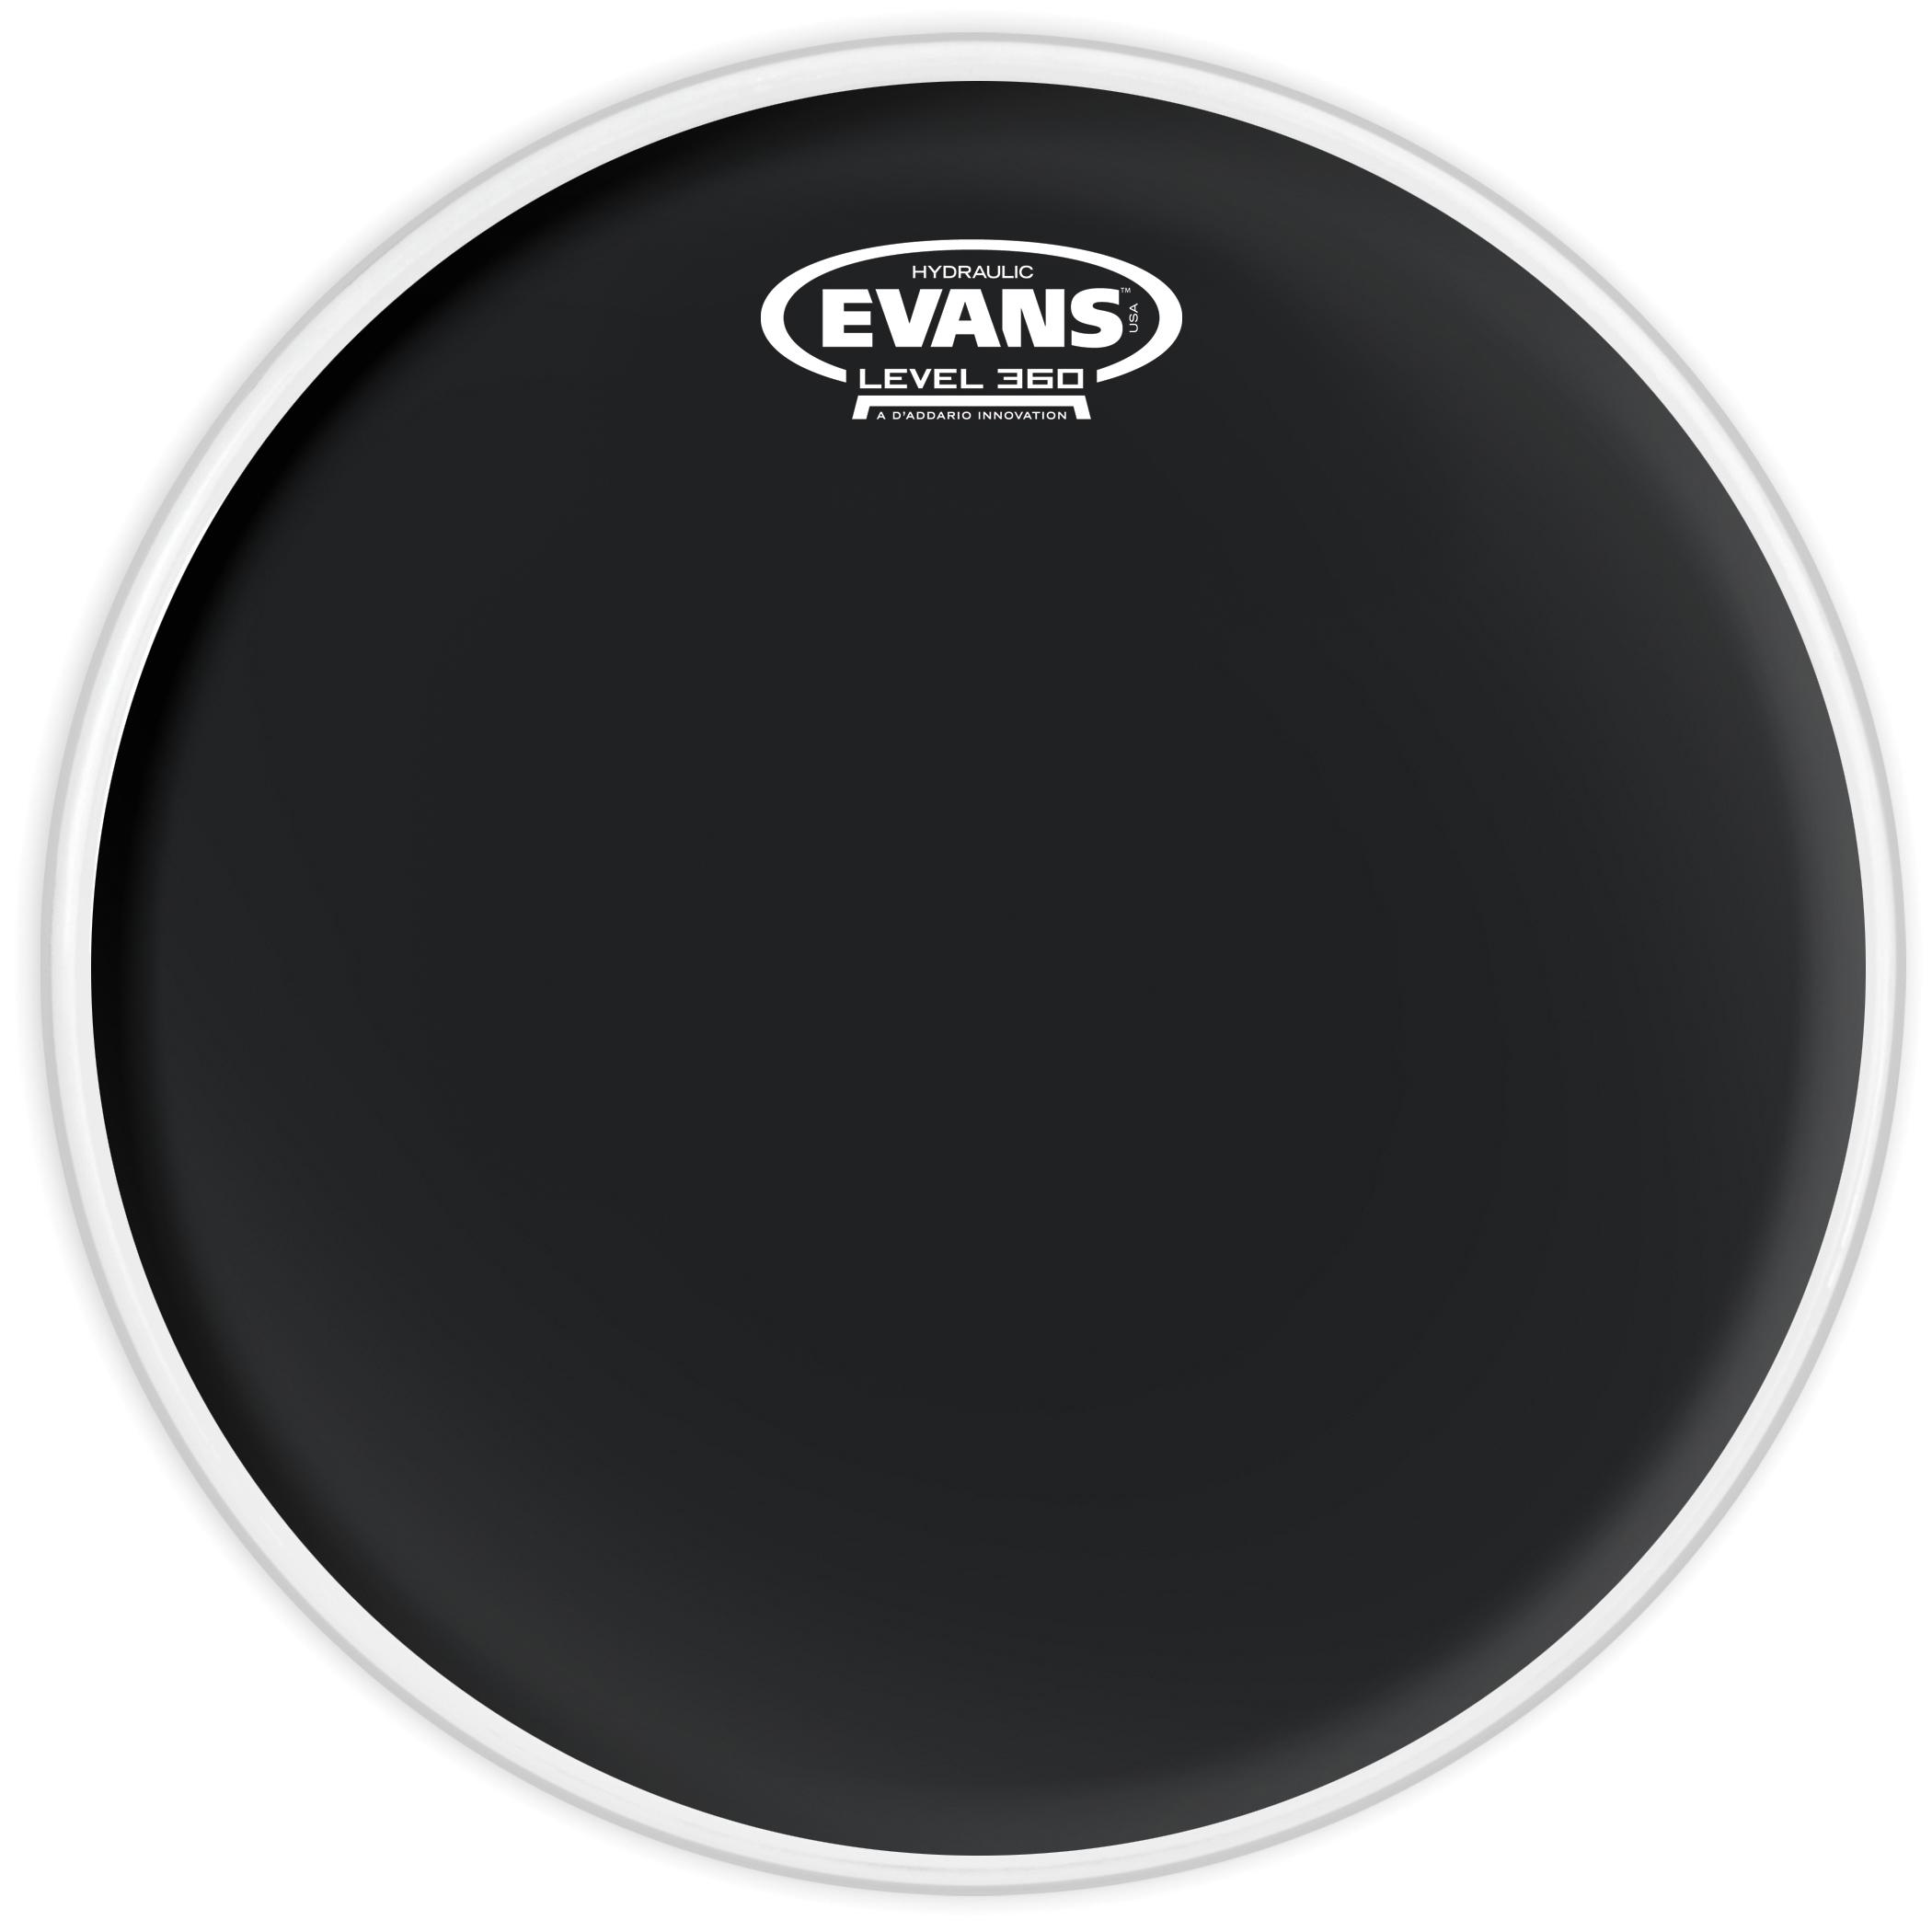 Evans Hydraulic Black Drum Head 10